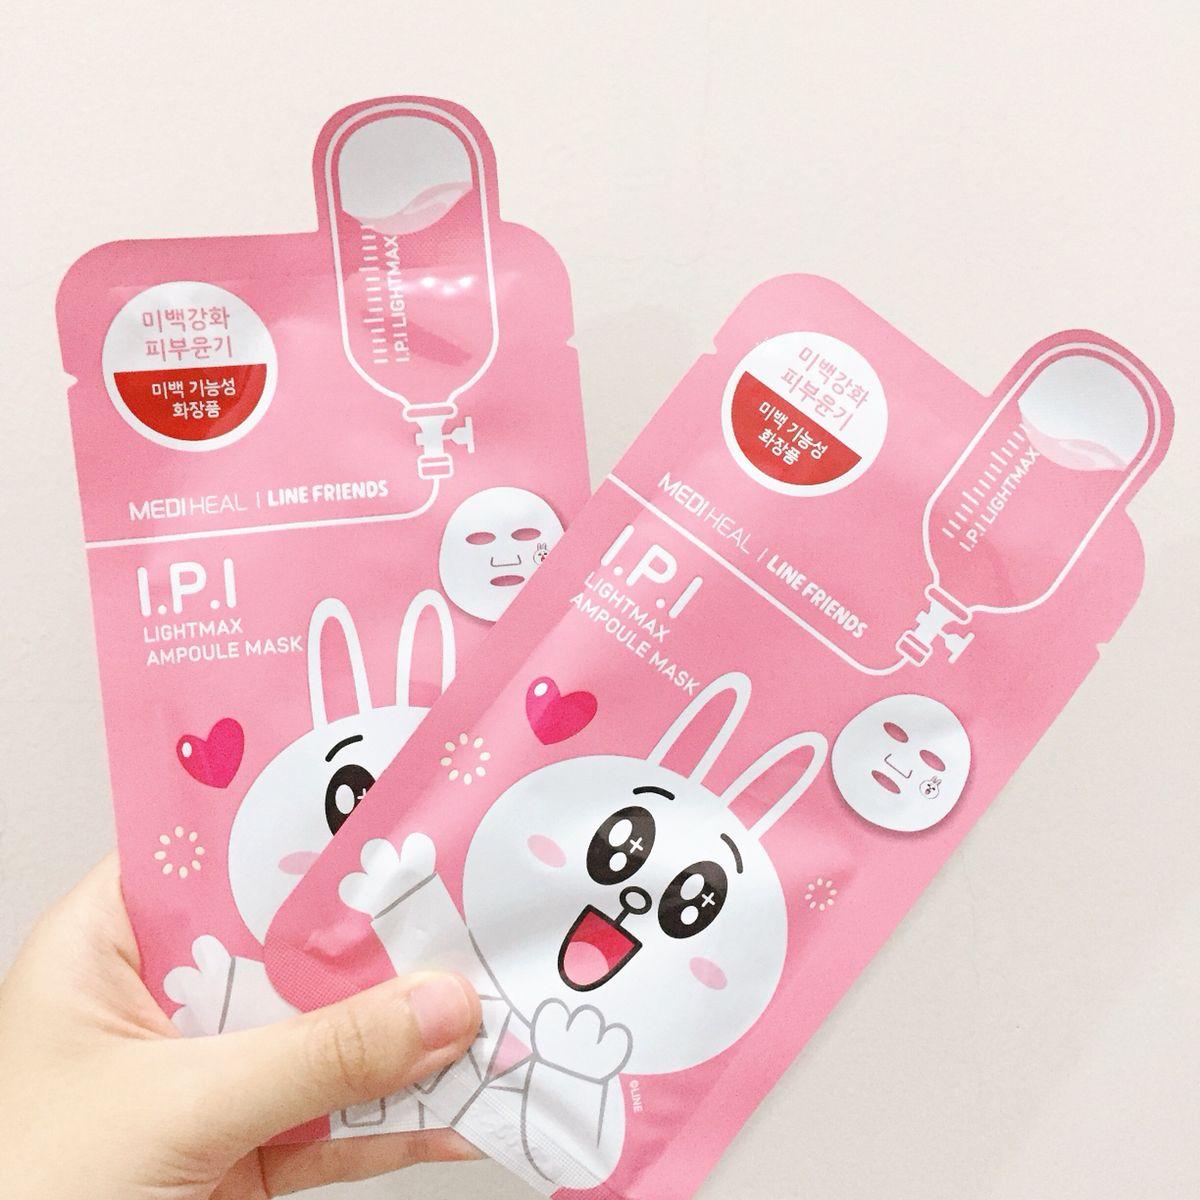 Cách sử dụng mặt nạMediheal Line-Friends Ampoule Mask Sheet 1